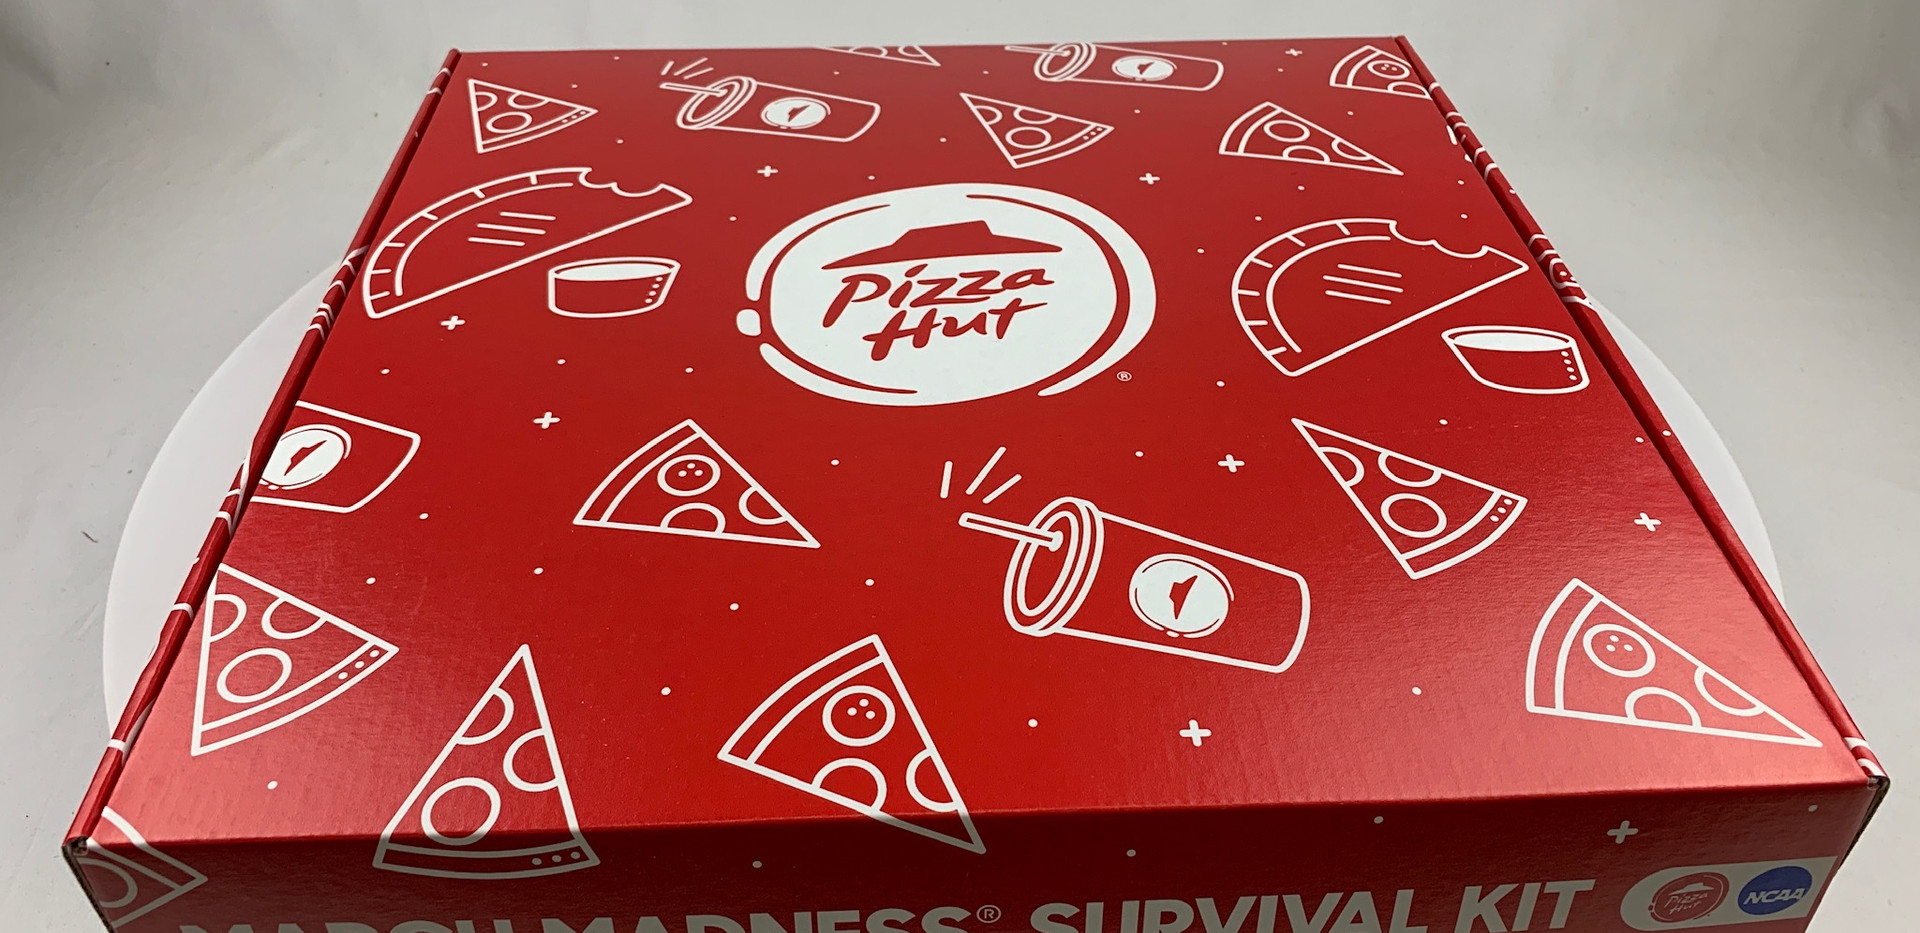 Pizza Hut March Madness Box